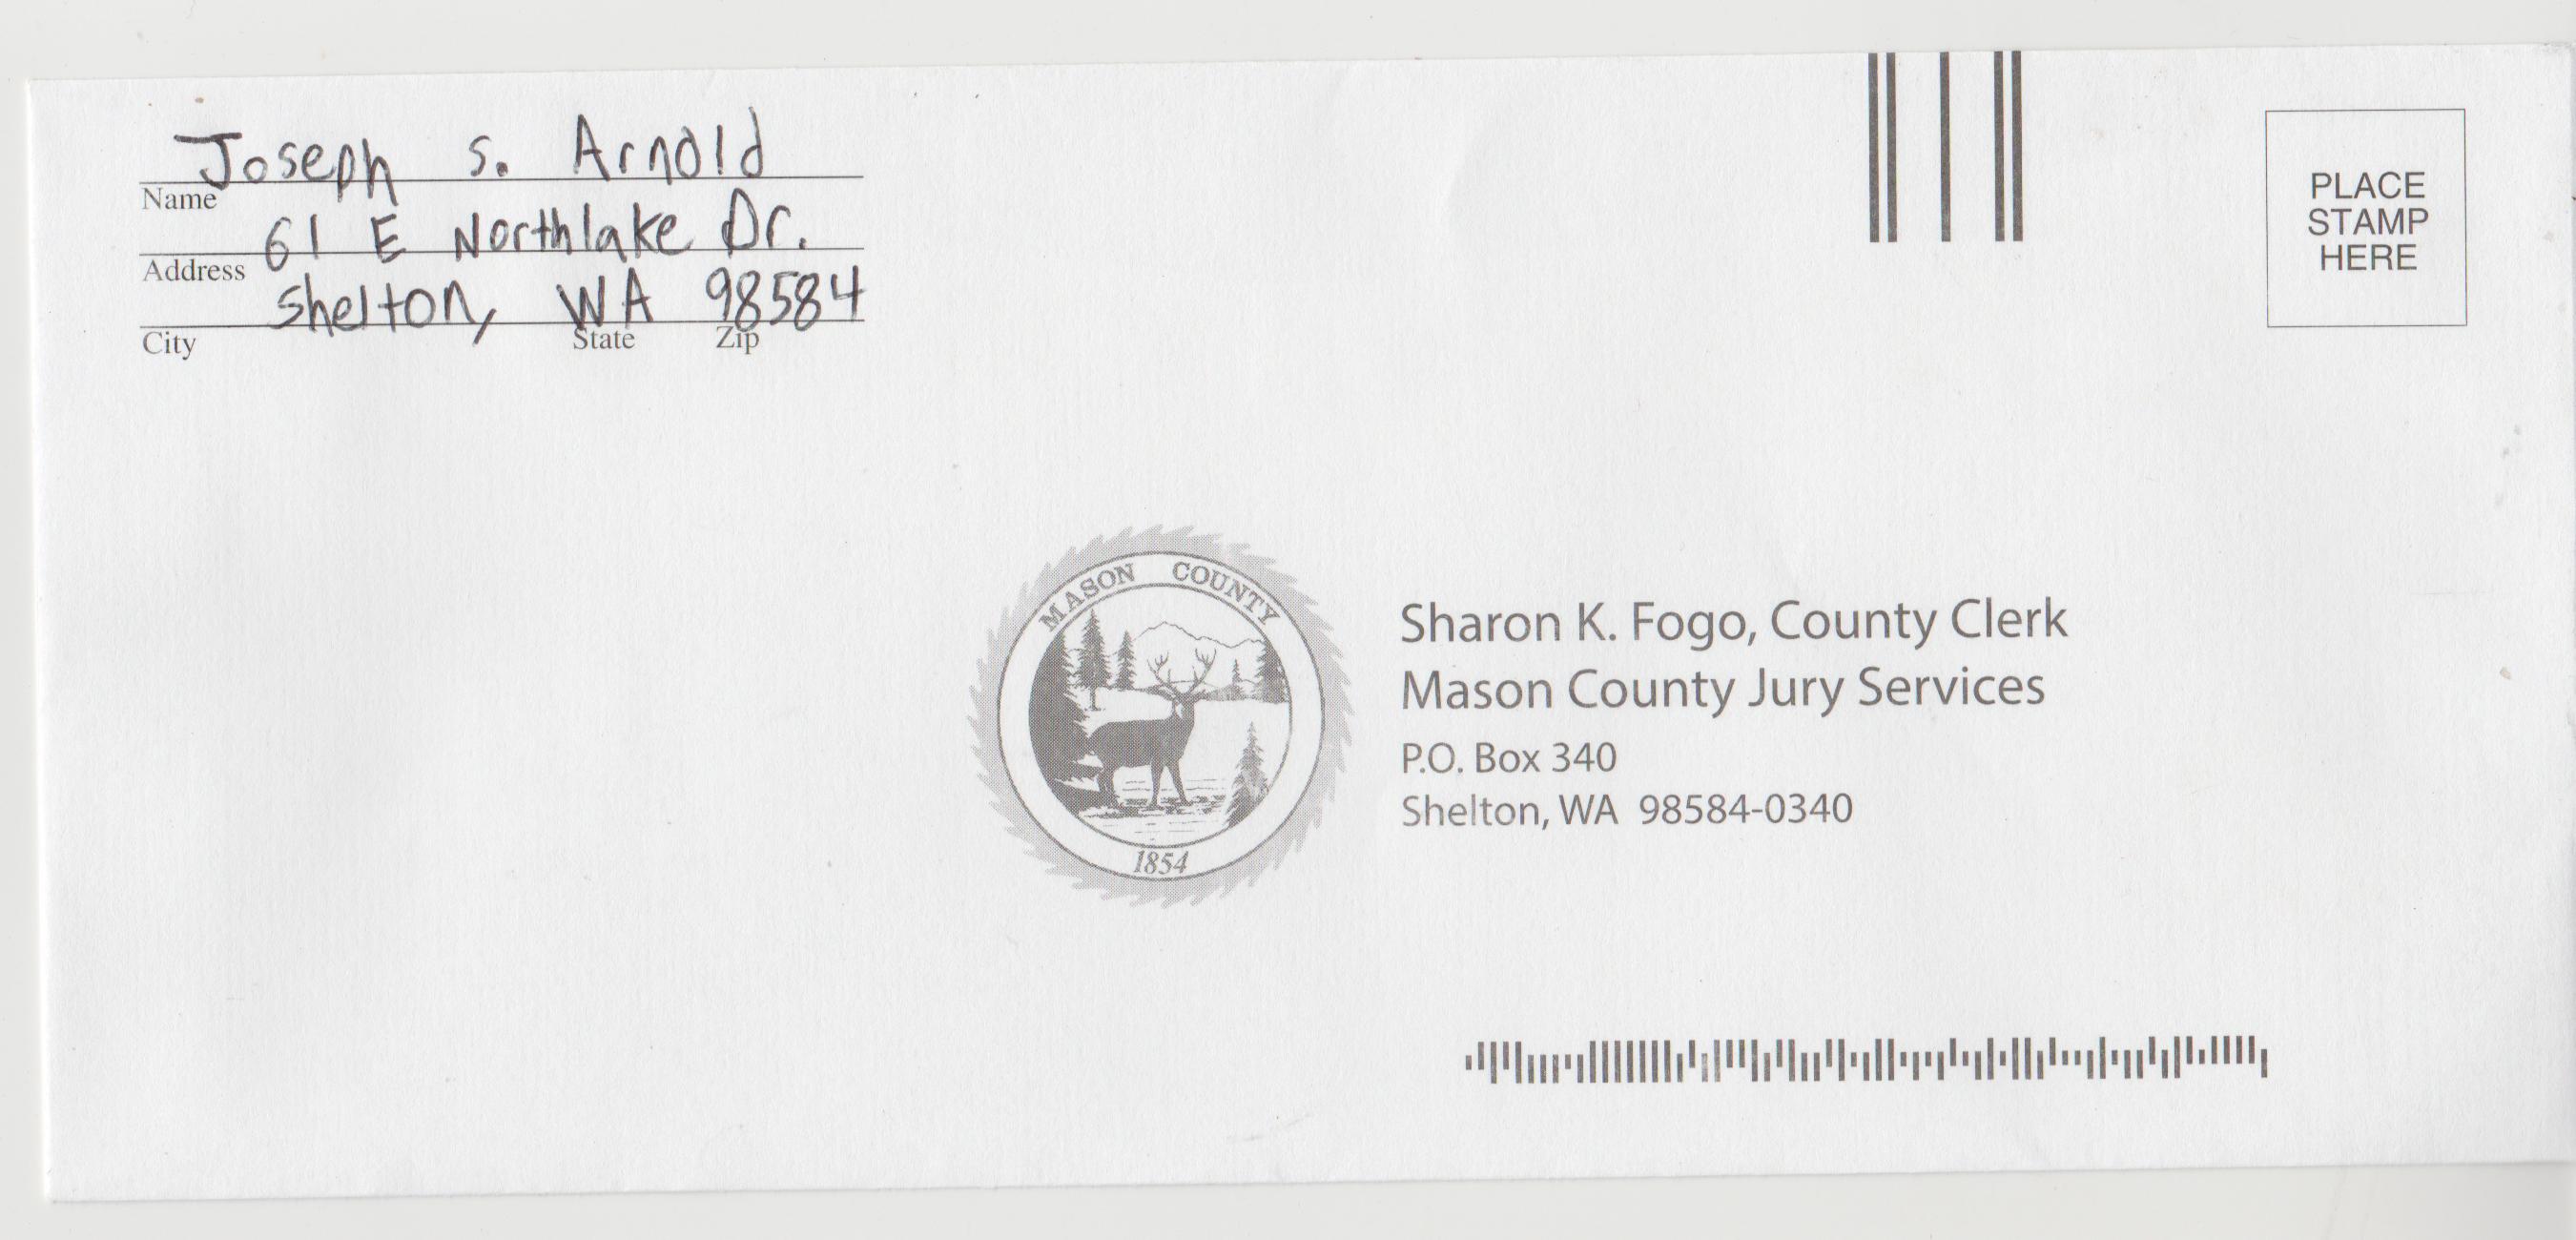 2020-11-07 - Saturday - 03:00 PM LMS JA - Jury Duty Request - Shelton WA - Return Envelope ok.png